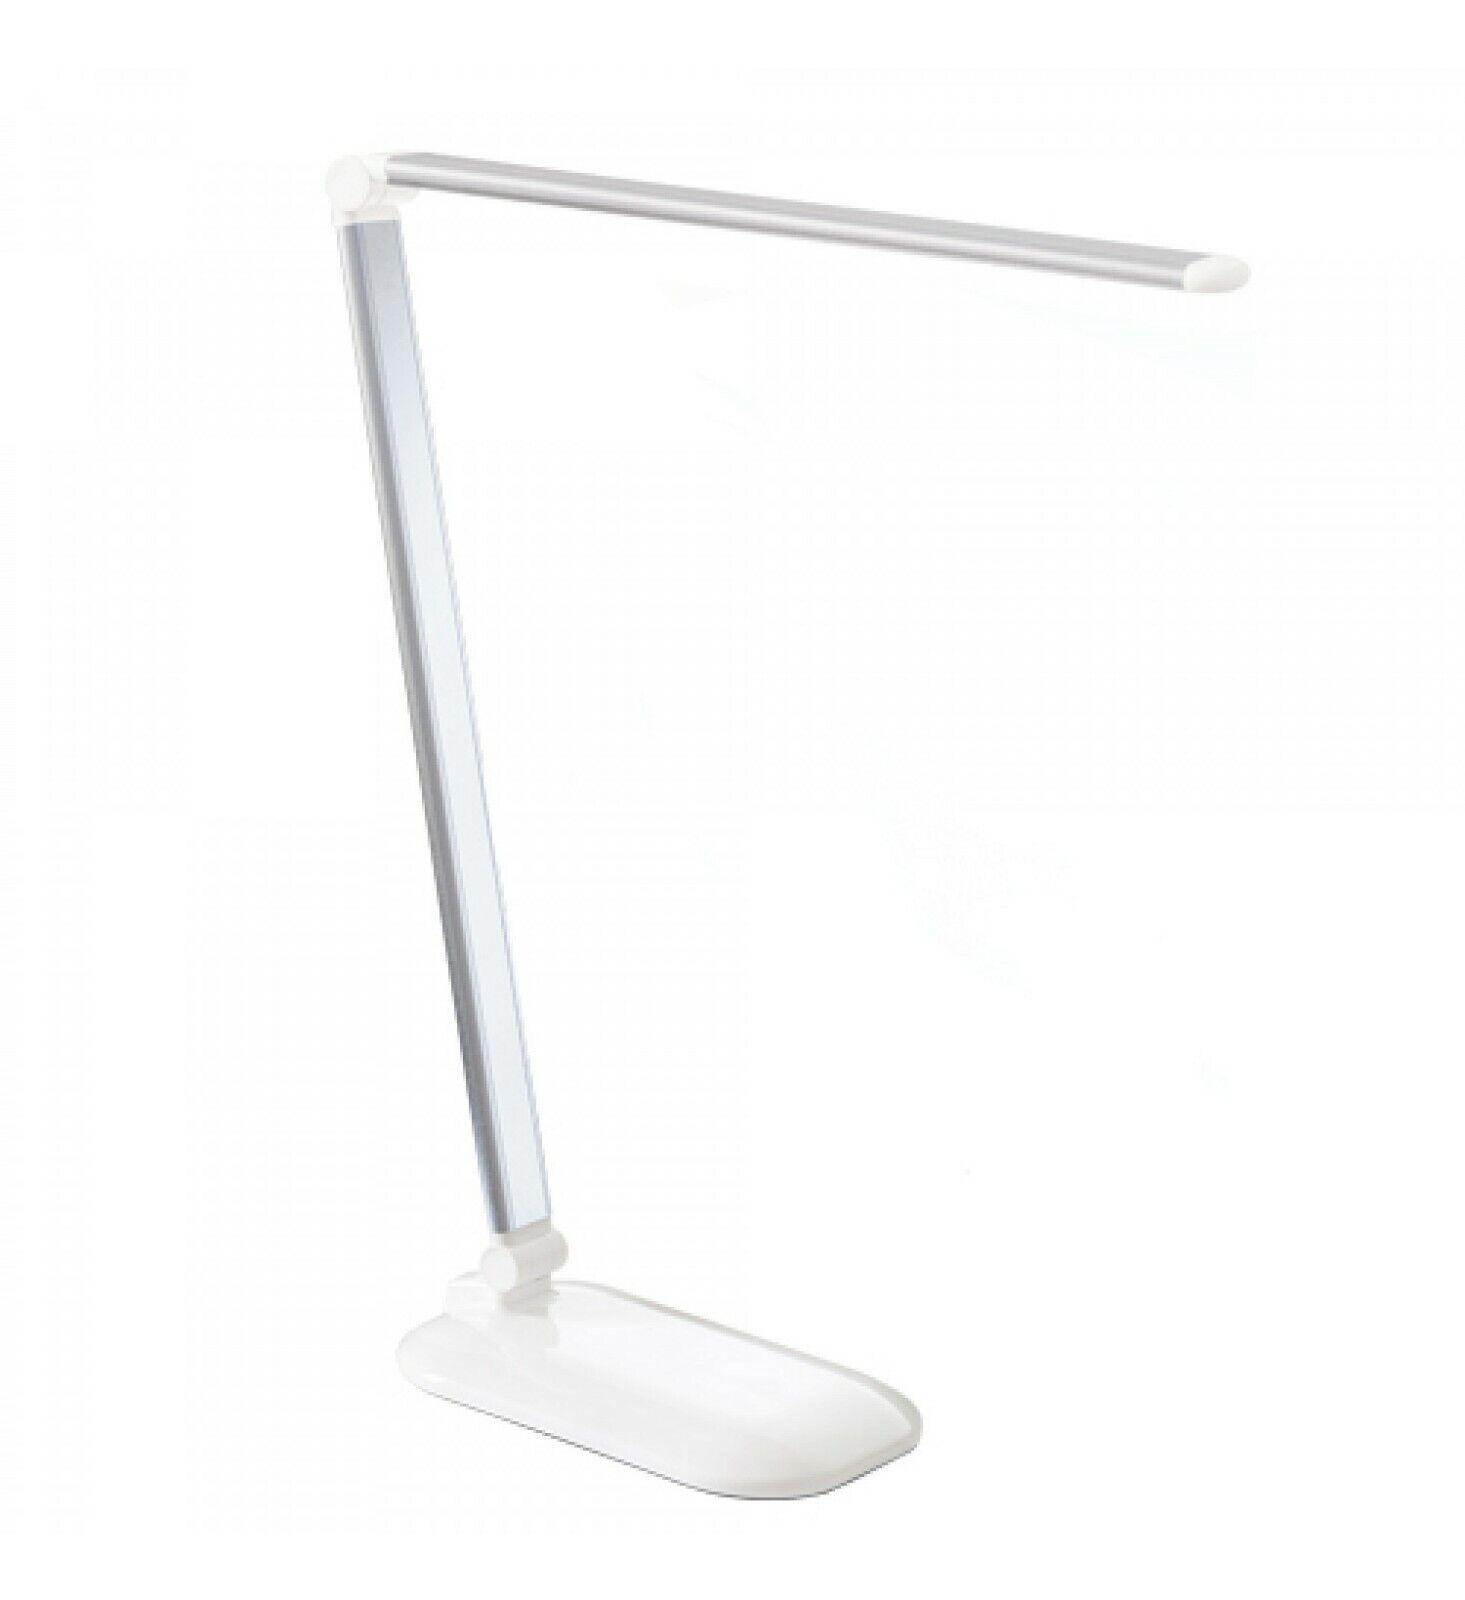 New Nail Art Touch LED Arbeitsplatzleuchte Silber Dimmer Nagelstudio Lampe Tisch